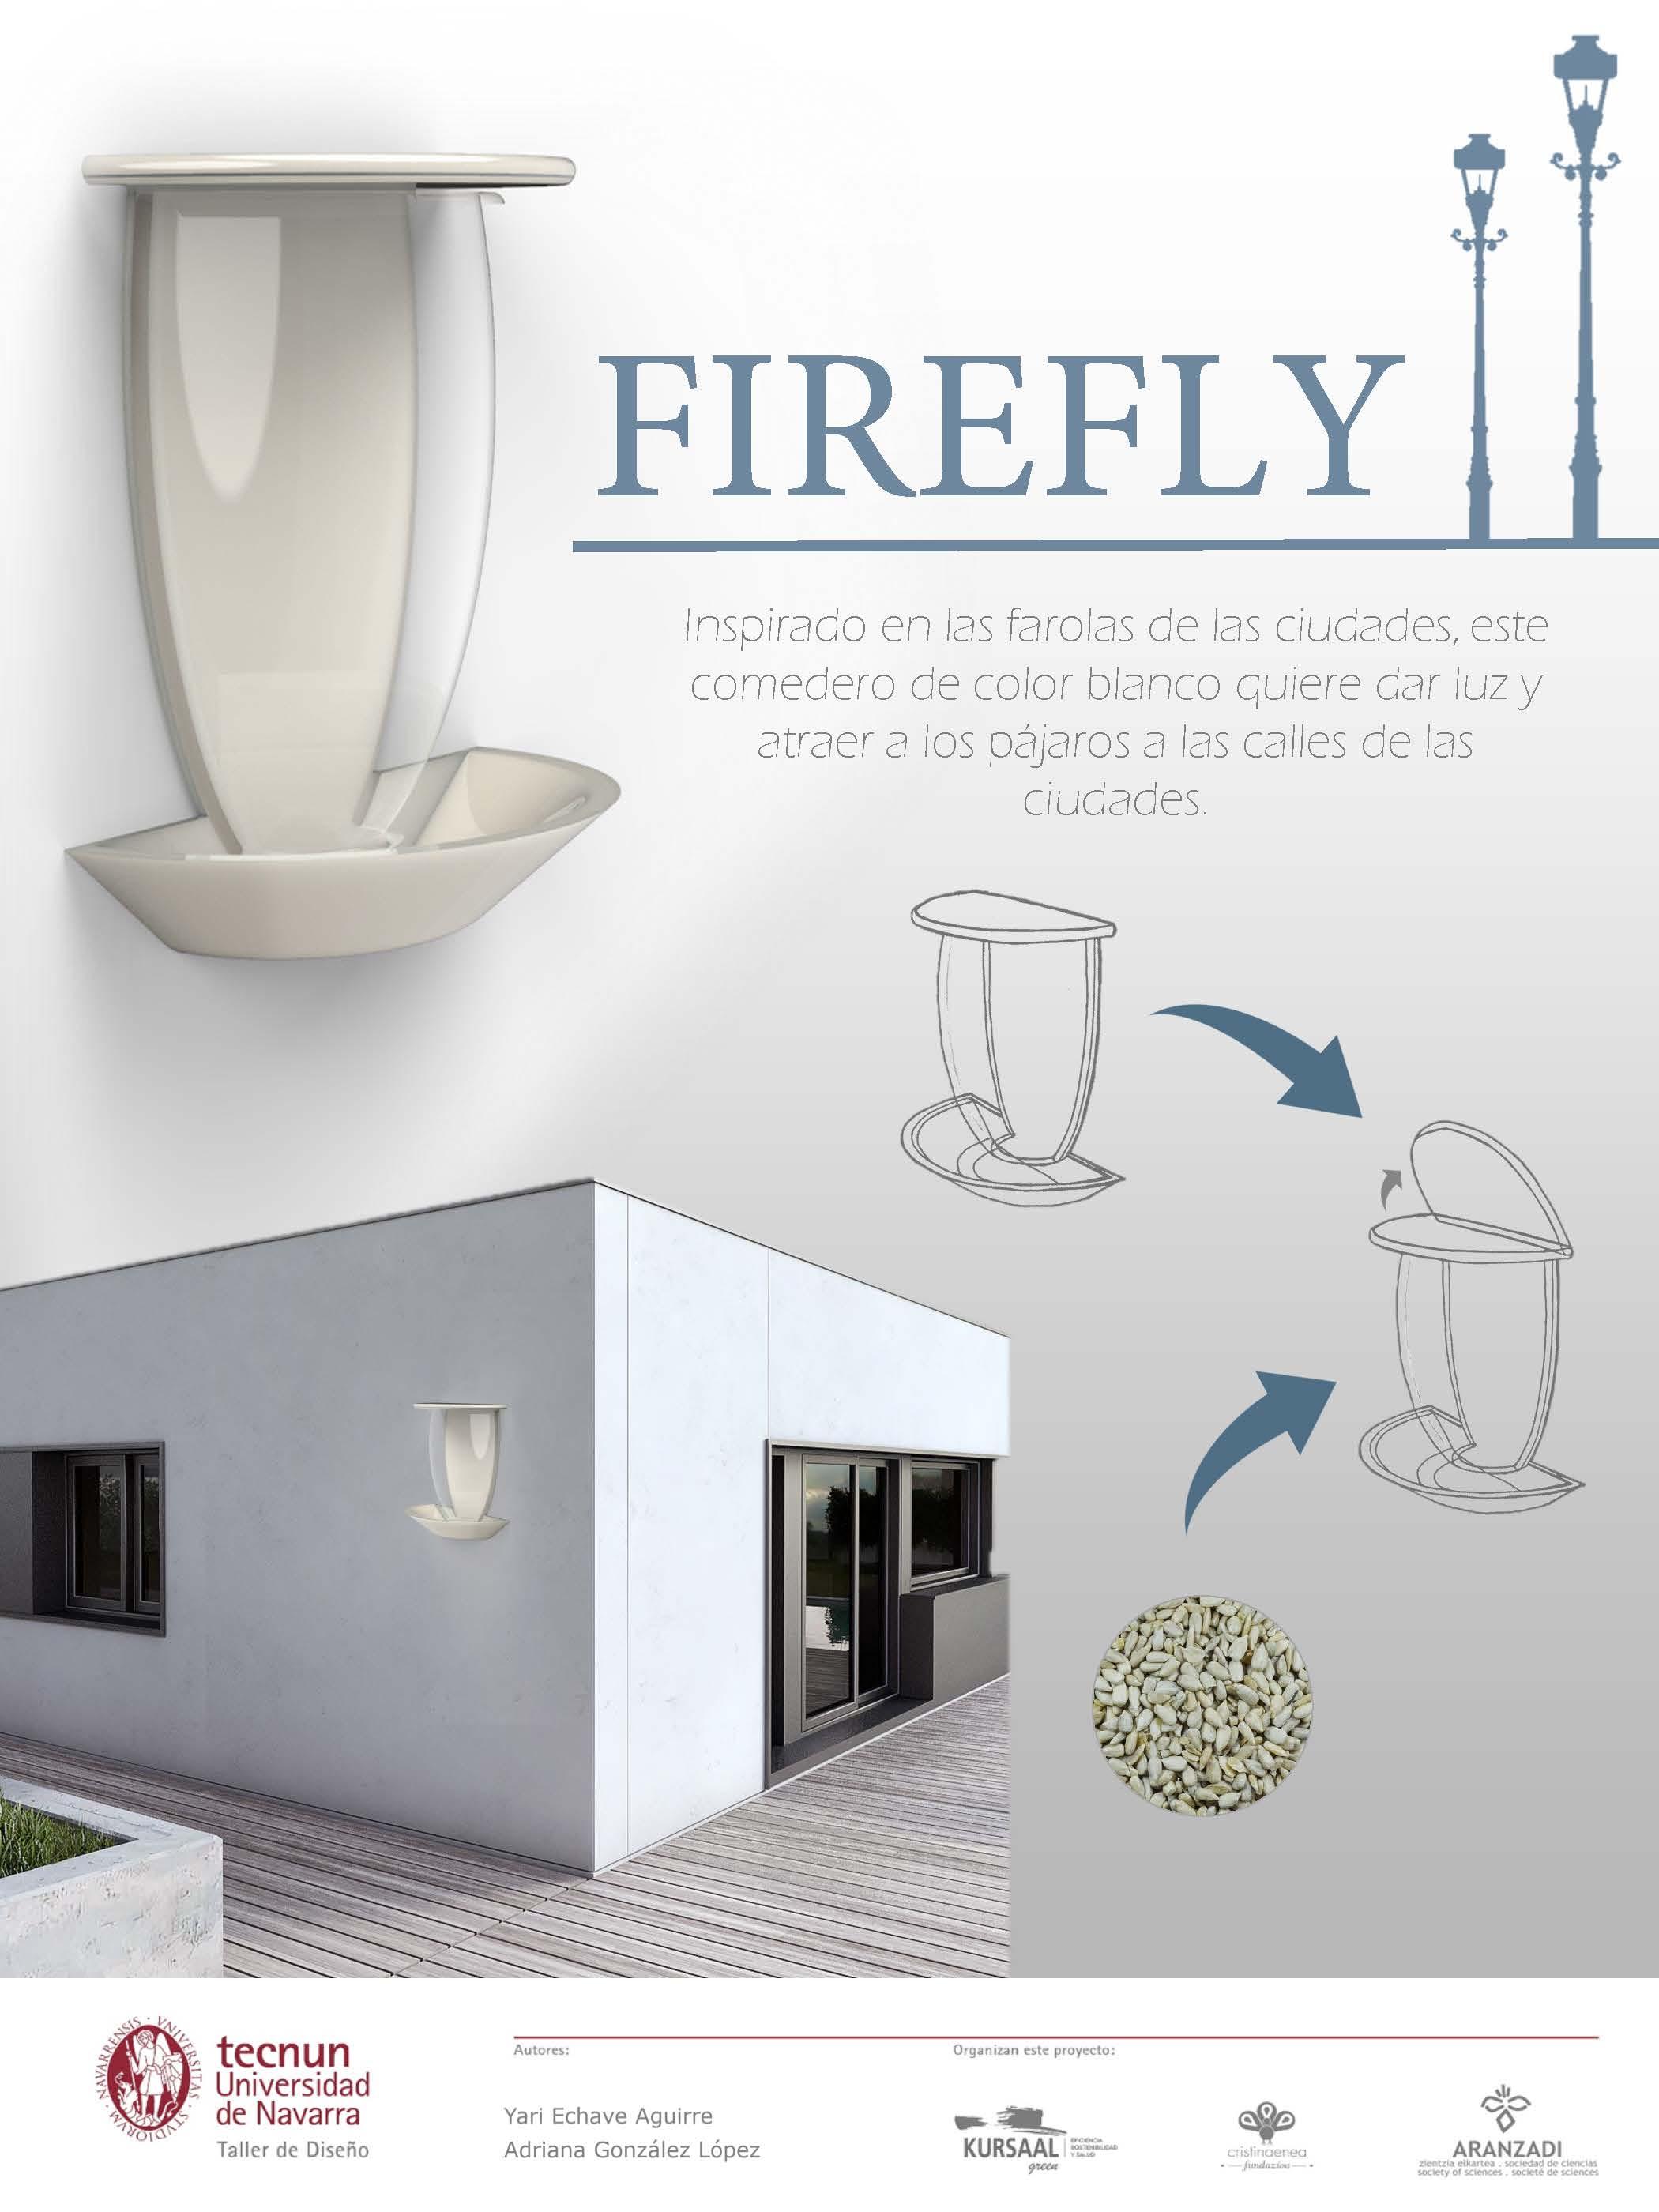 Taller de diseño - Tecnum - Txoriak - FIREFLY